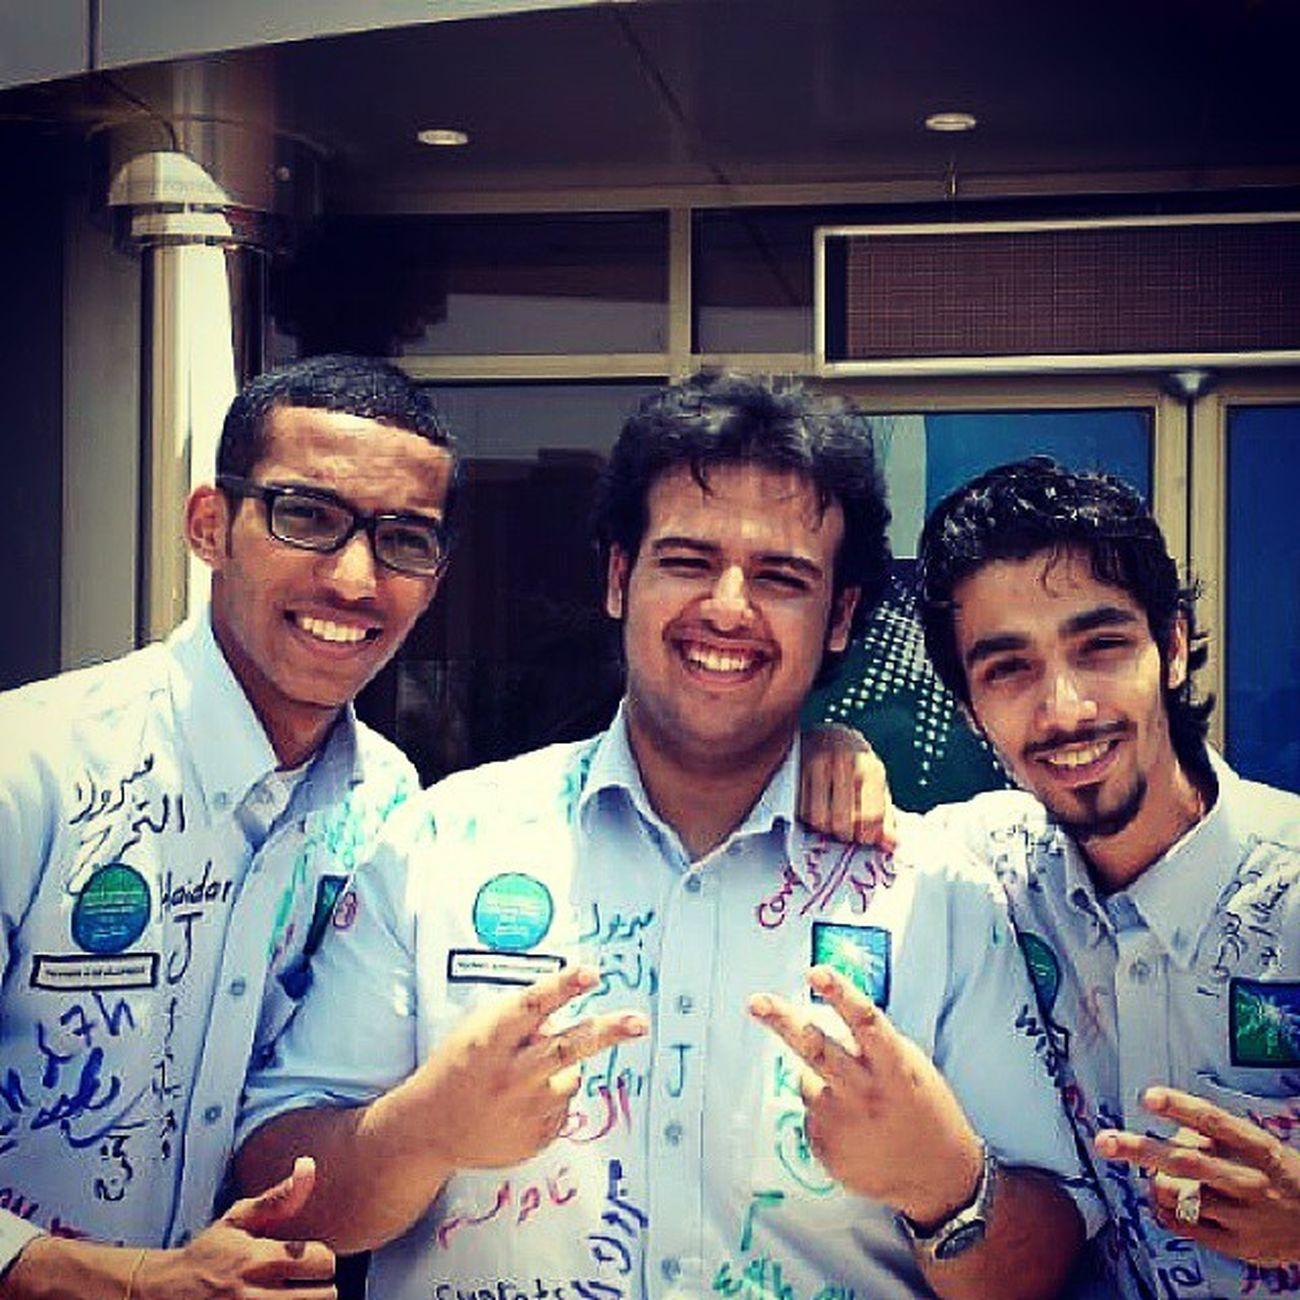 Abqaiq Aramco_training Aramco_itc Aramco abqaiq_ITC يوم_التخرج graduation_day graduation